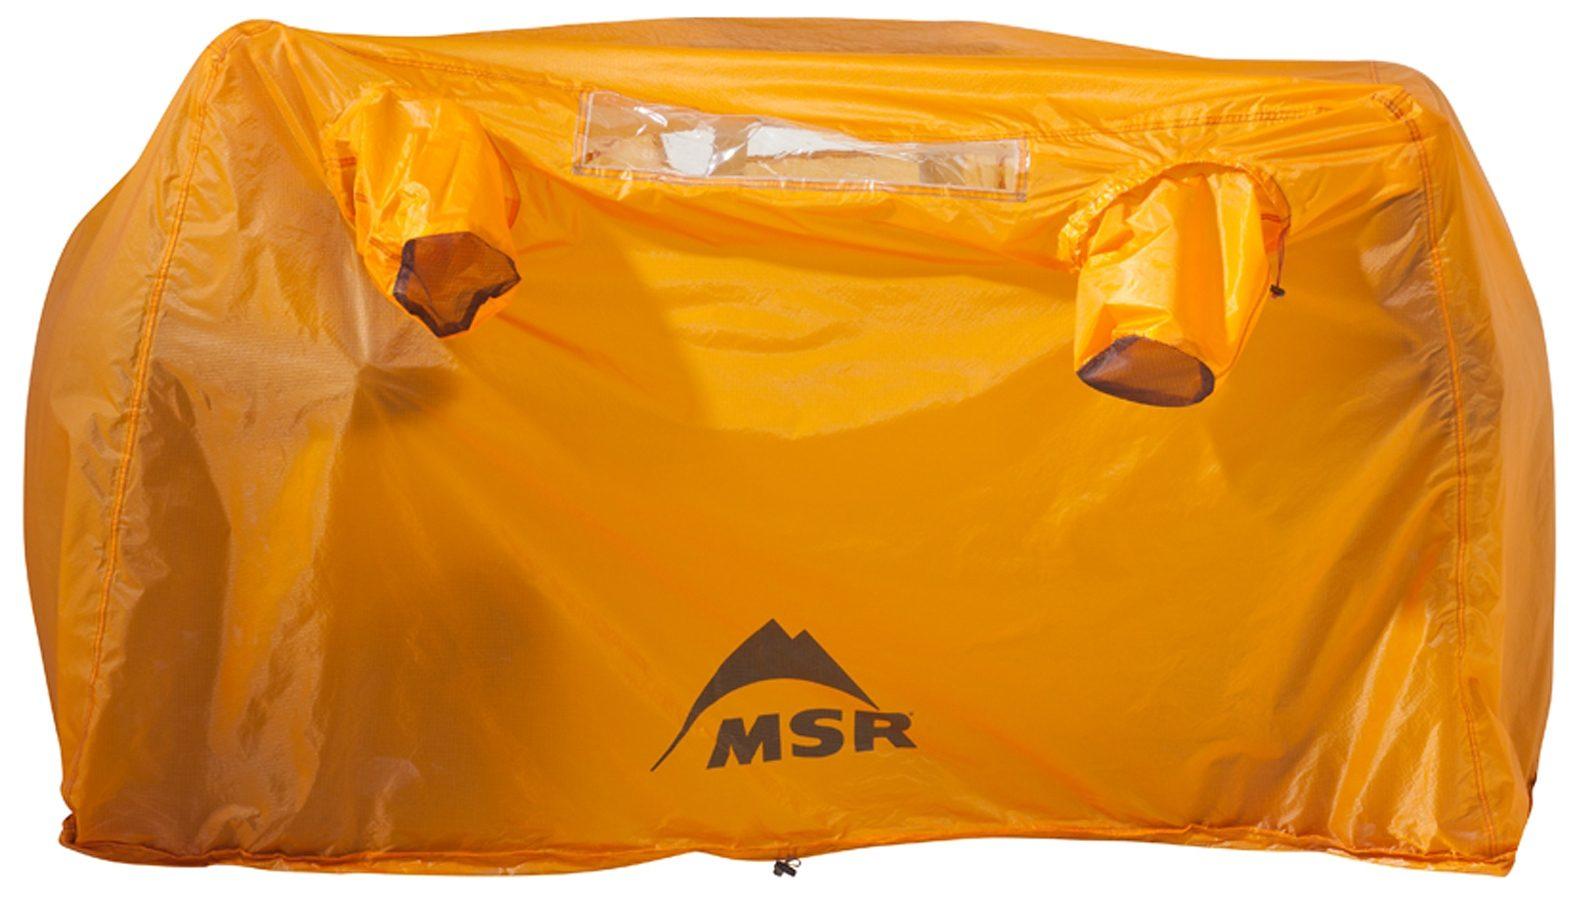 MSR Zeltzubehör »Munro Bothy 4 Tent«